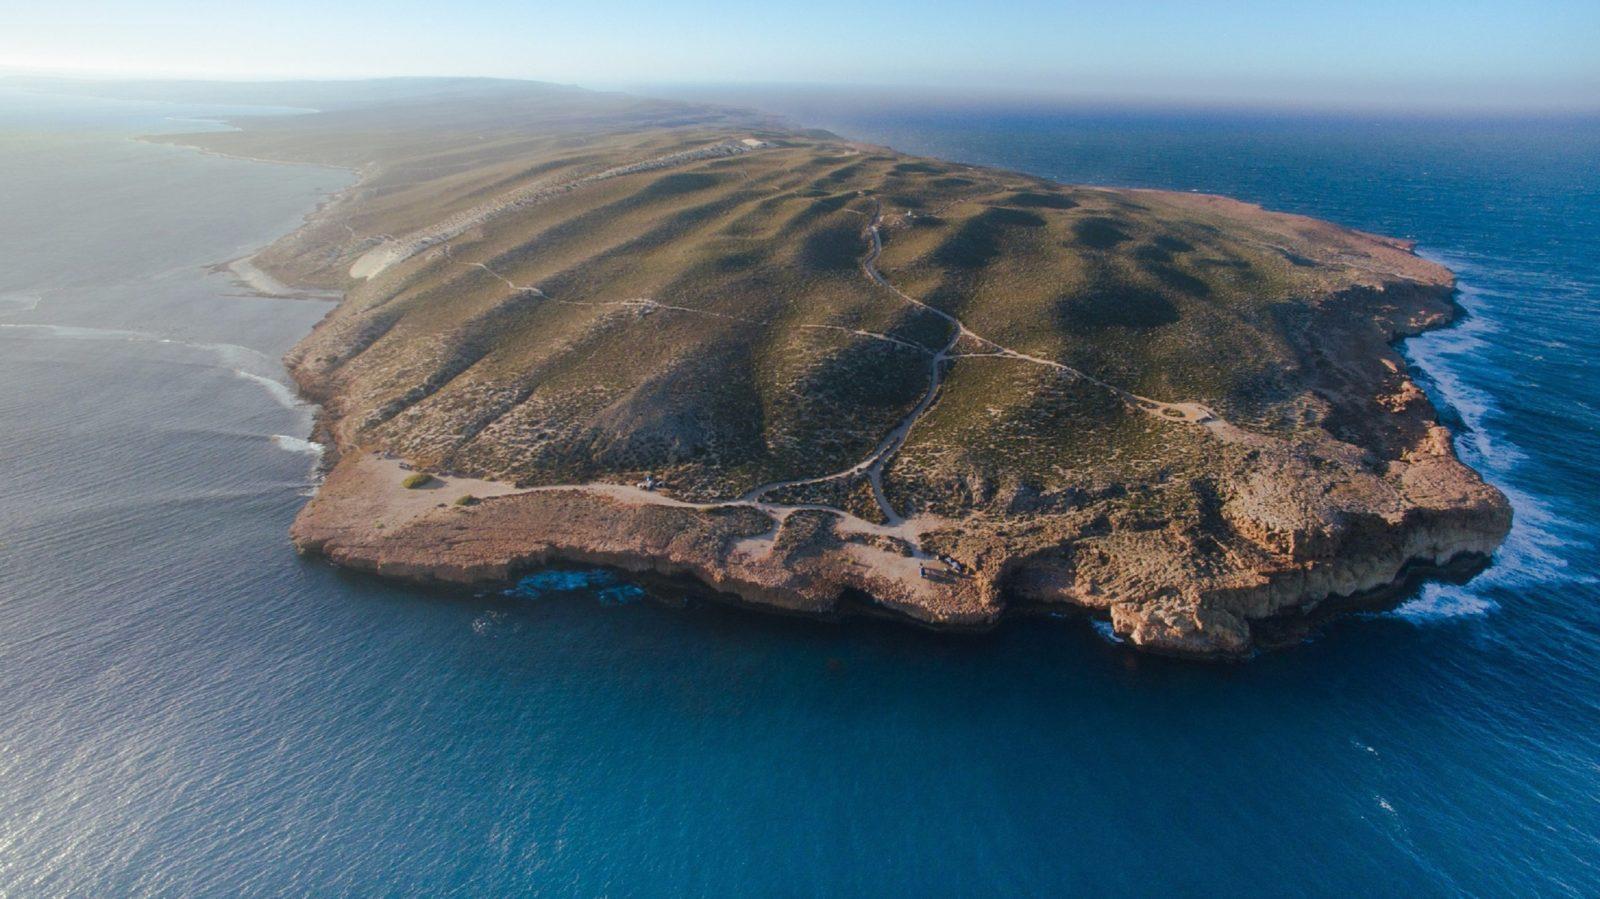 Dirk Hartog Island National Park, Dirk Hartog Island, Western Australia